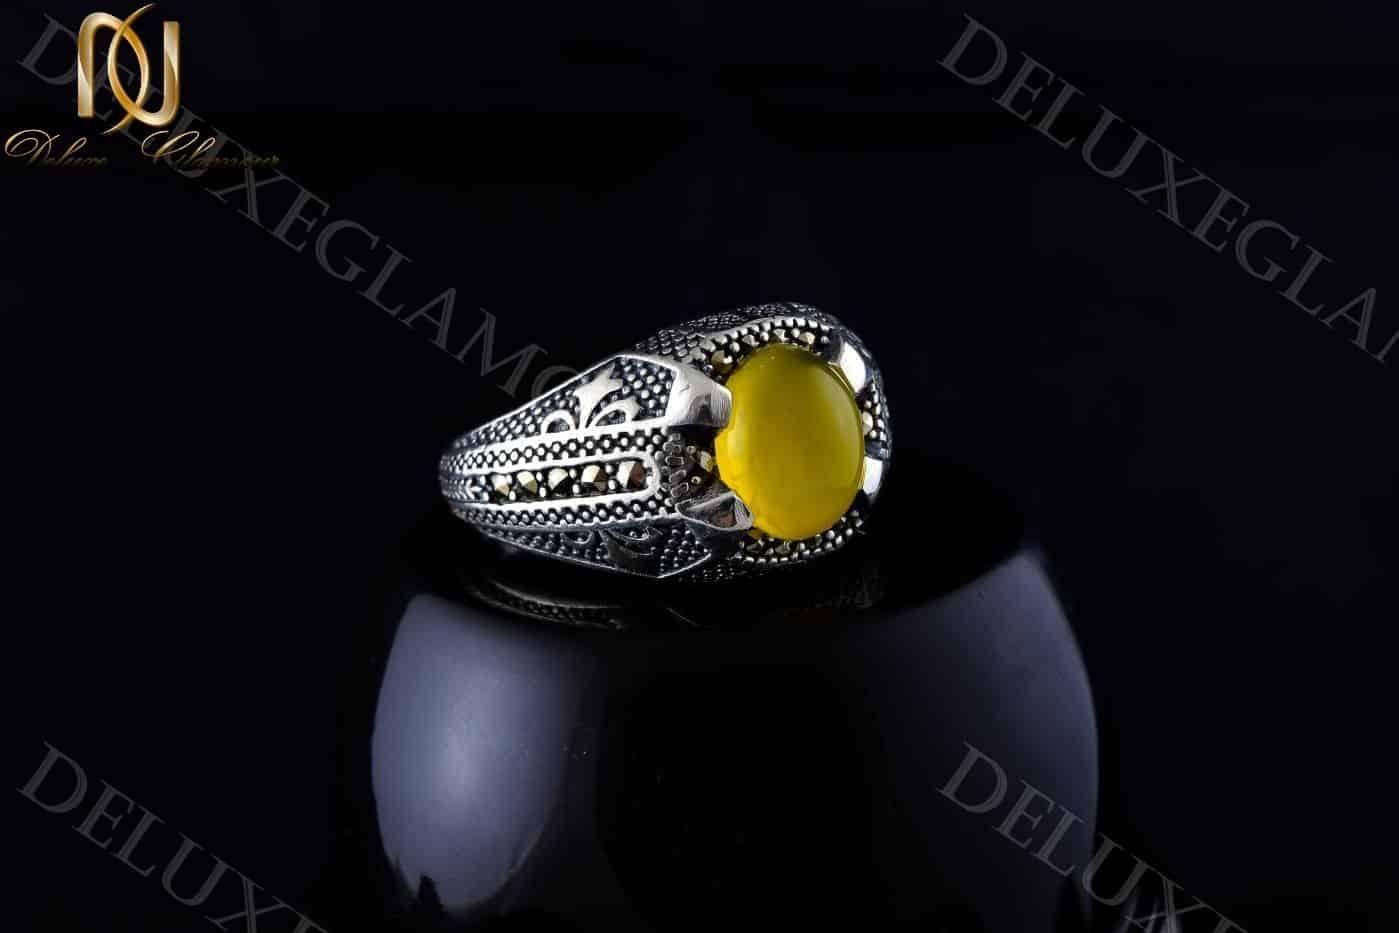 انگشتر مردانه نقره با سنگ عقیق زرد Rg-n202